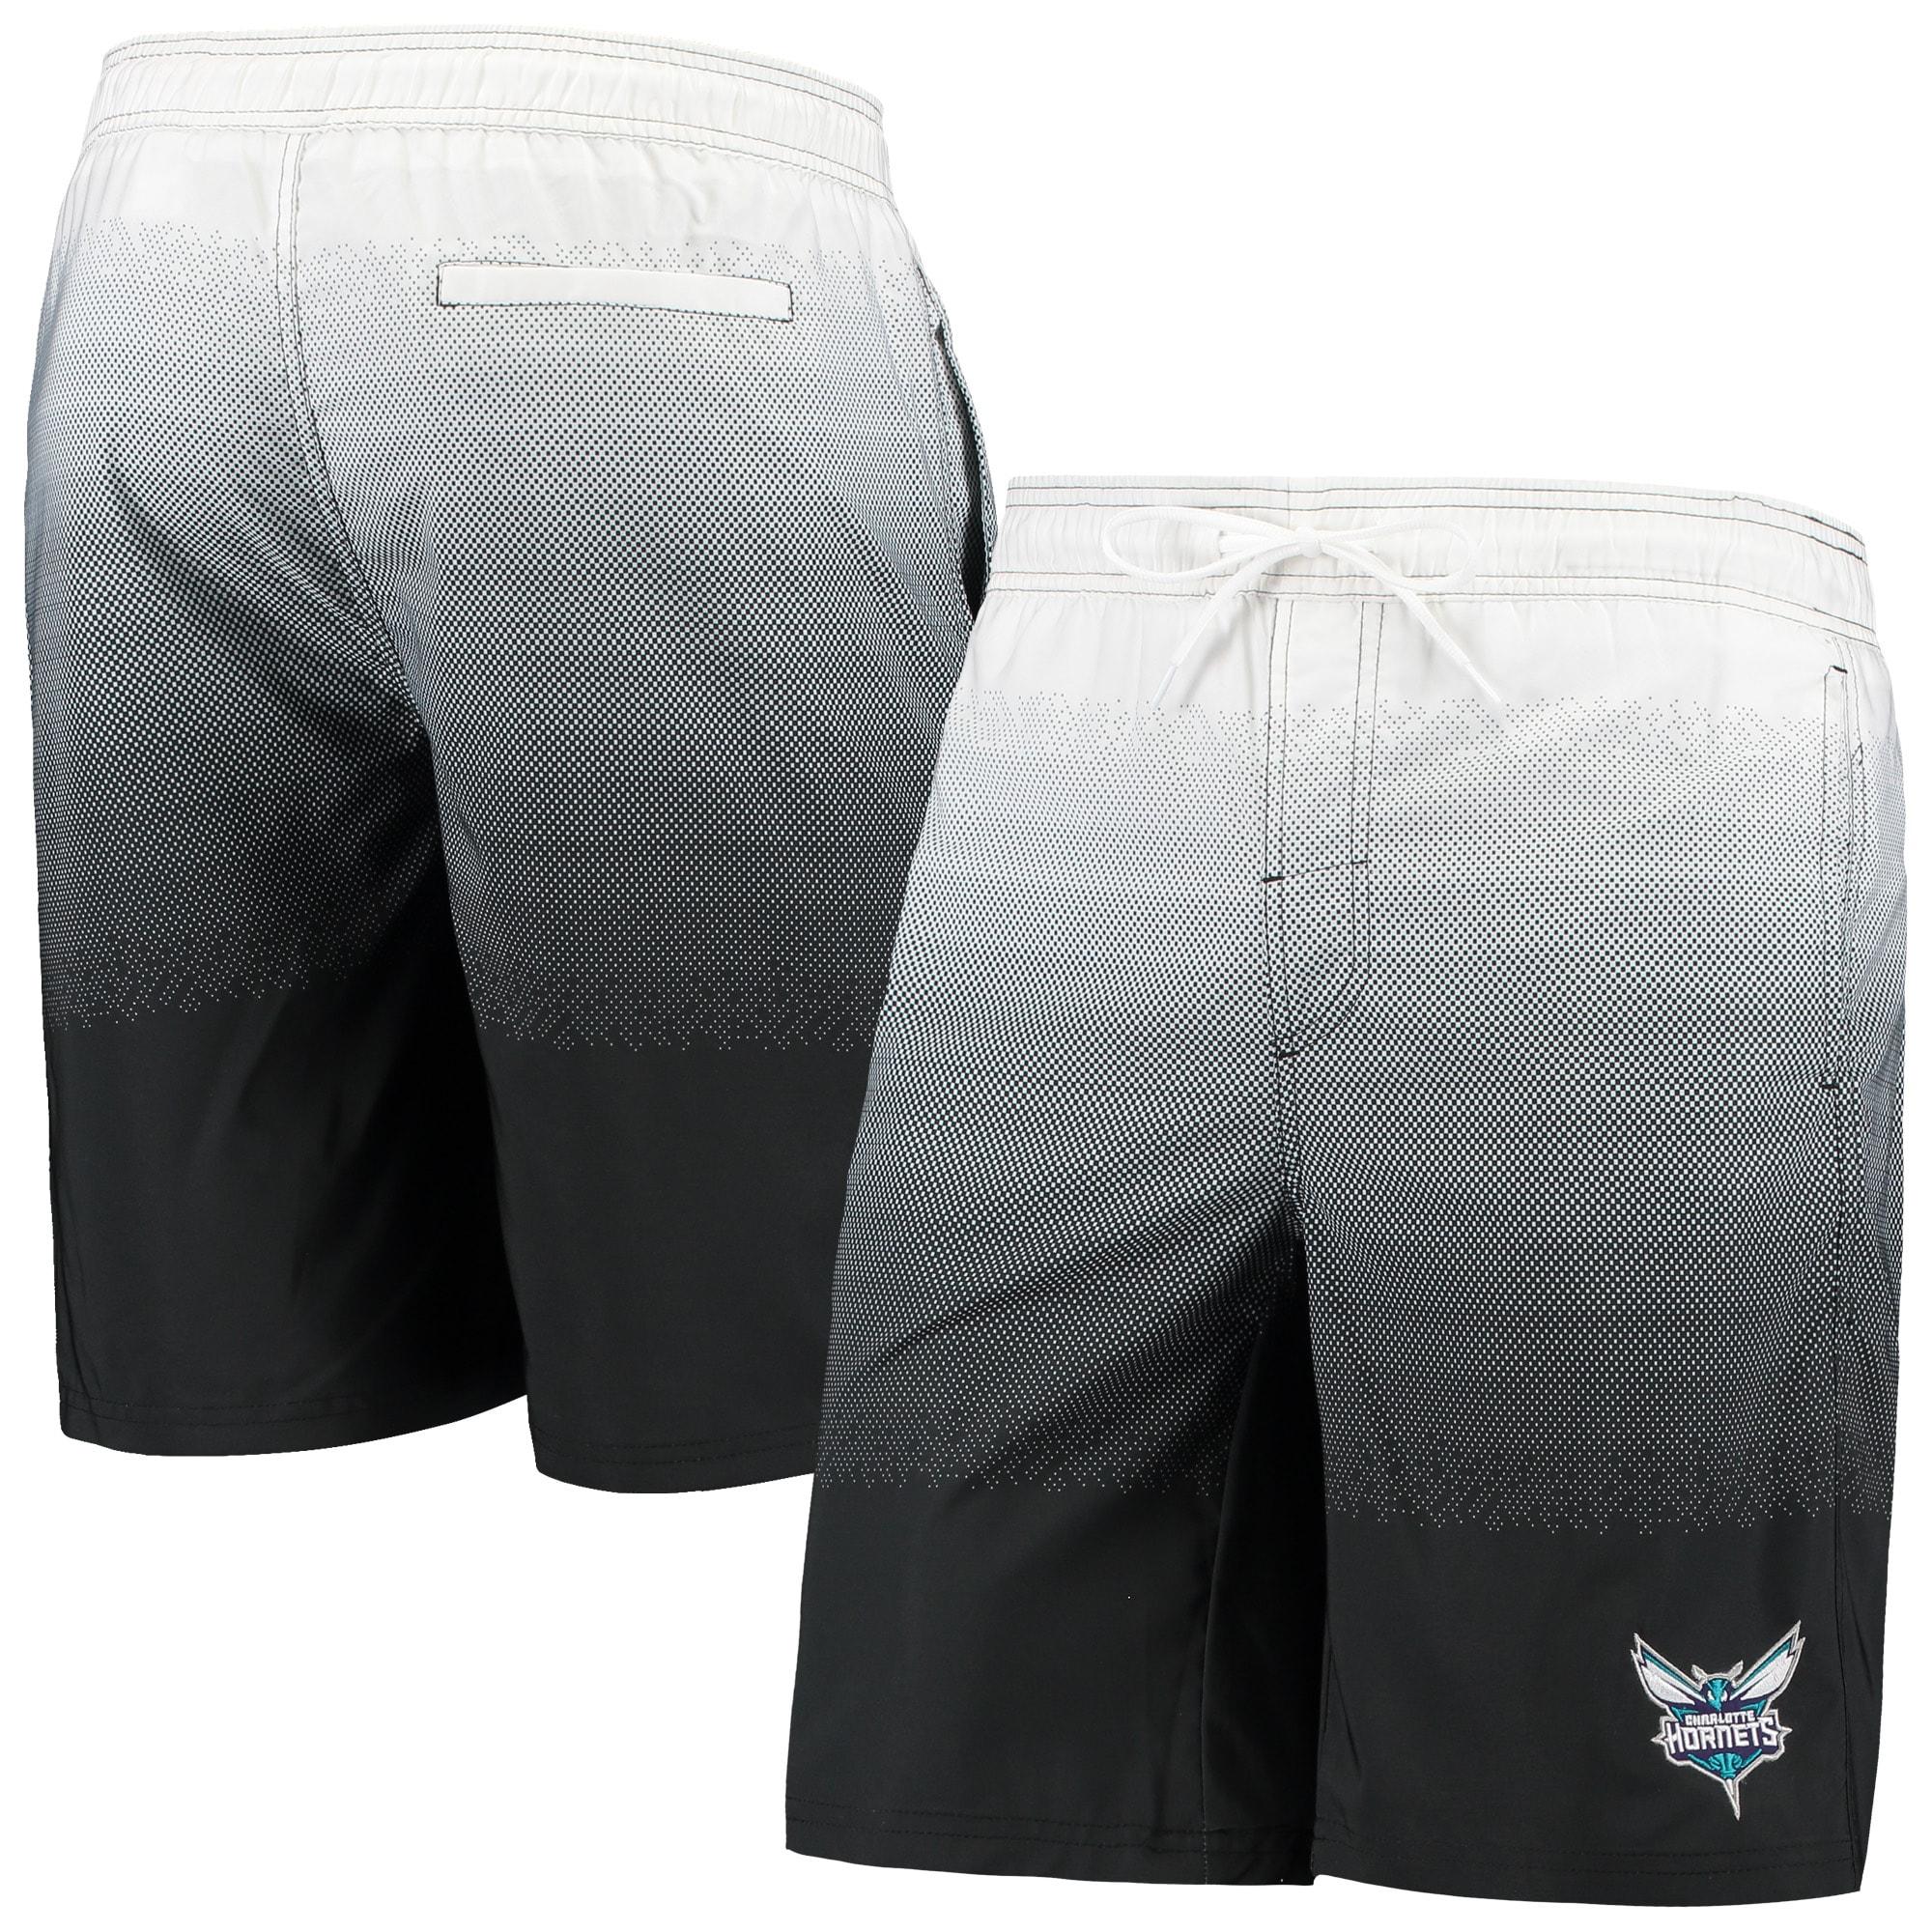 Charlotte Hornets G-III Sports by Carl Banks Horizon Swim Trunks - Black